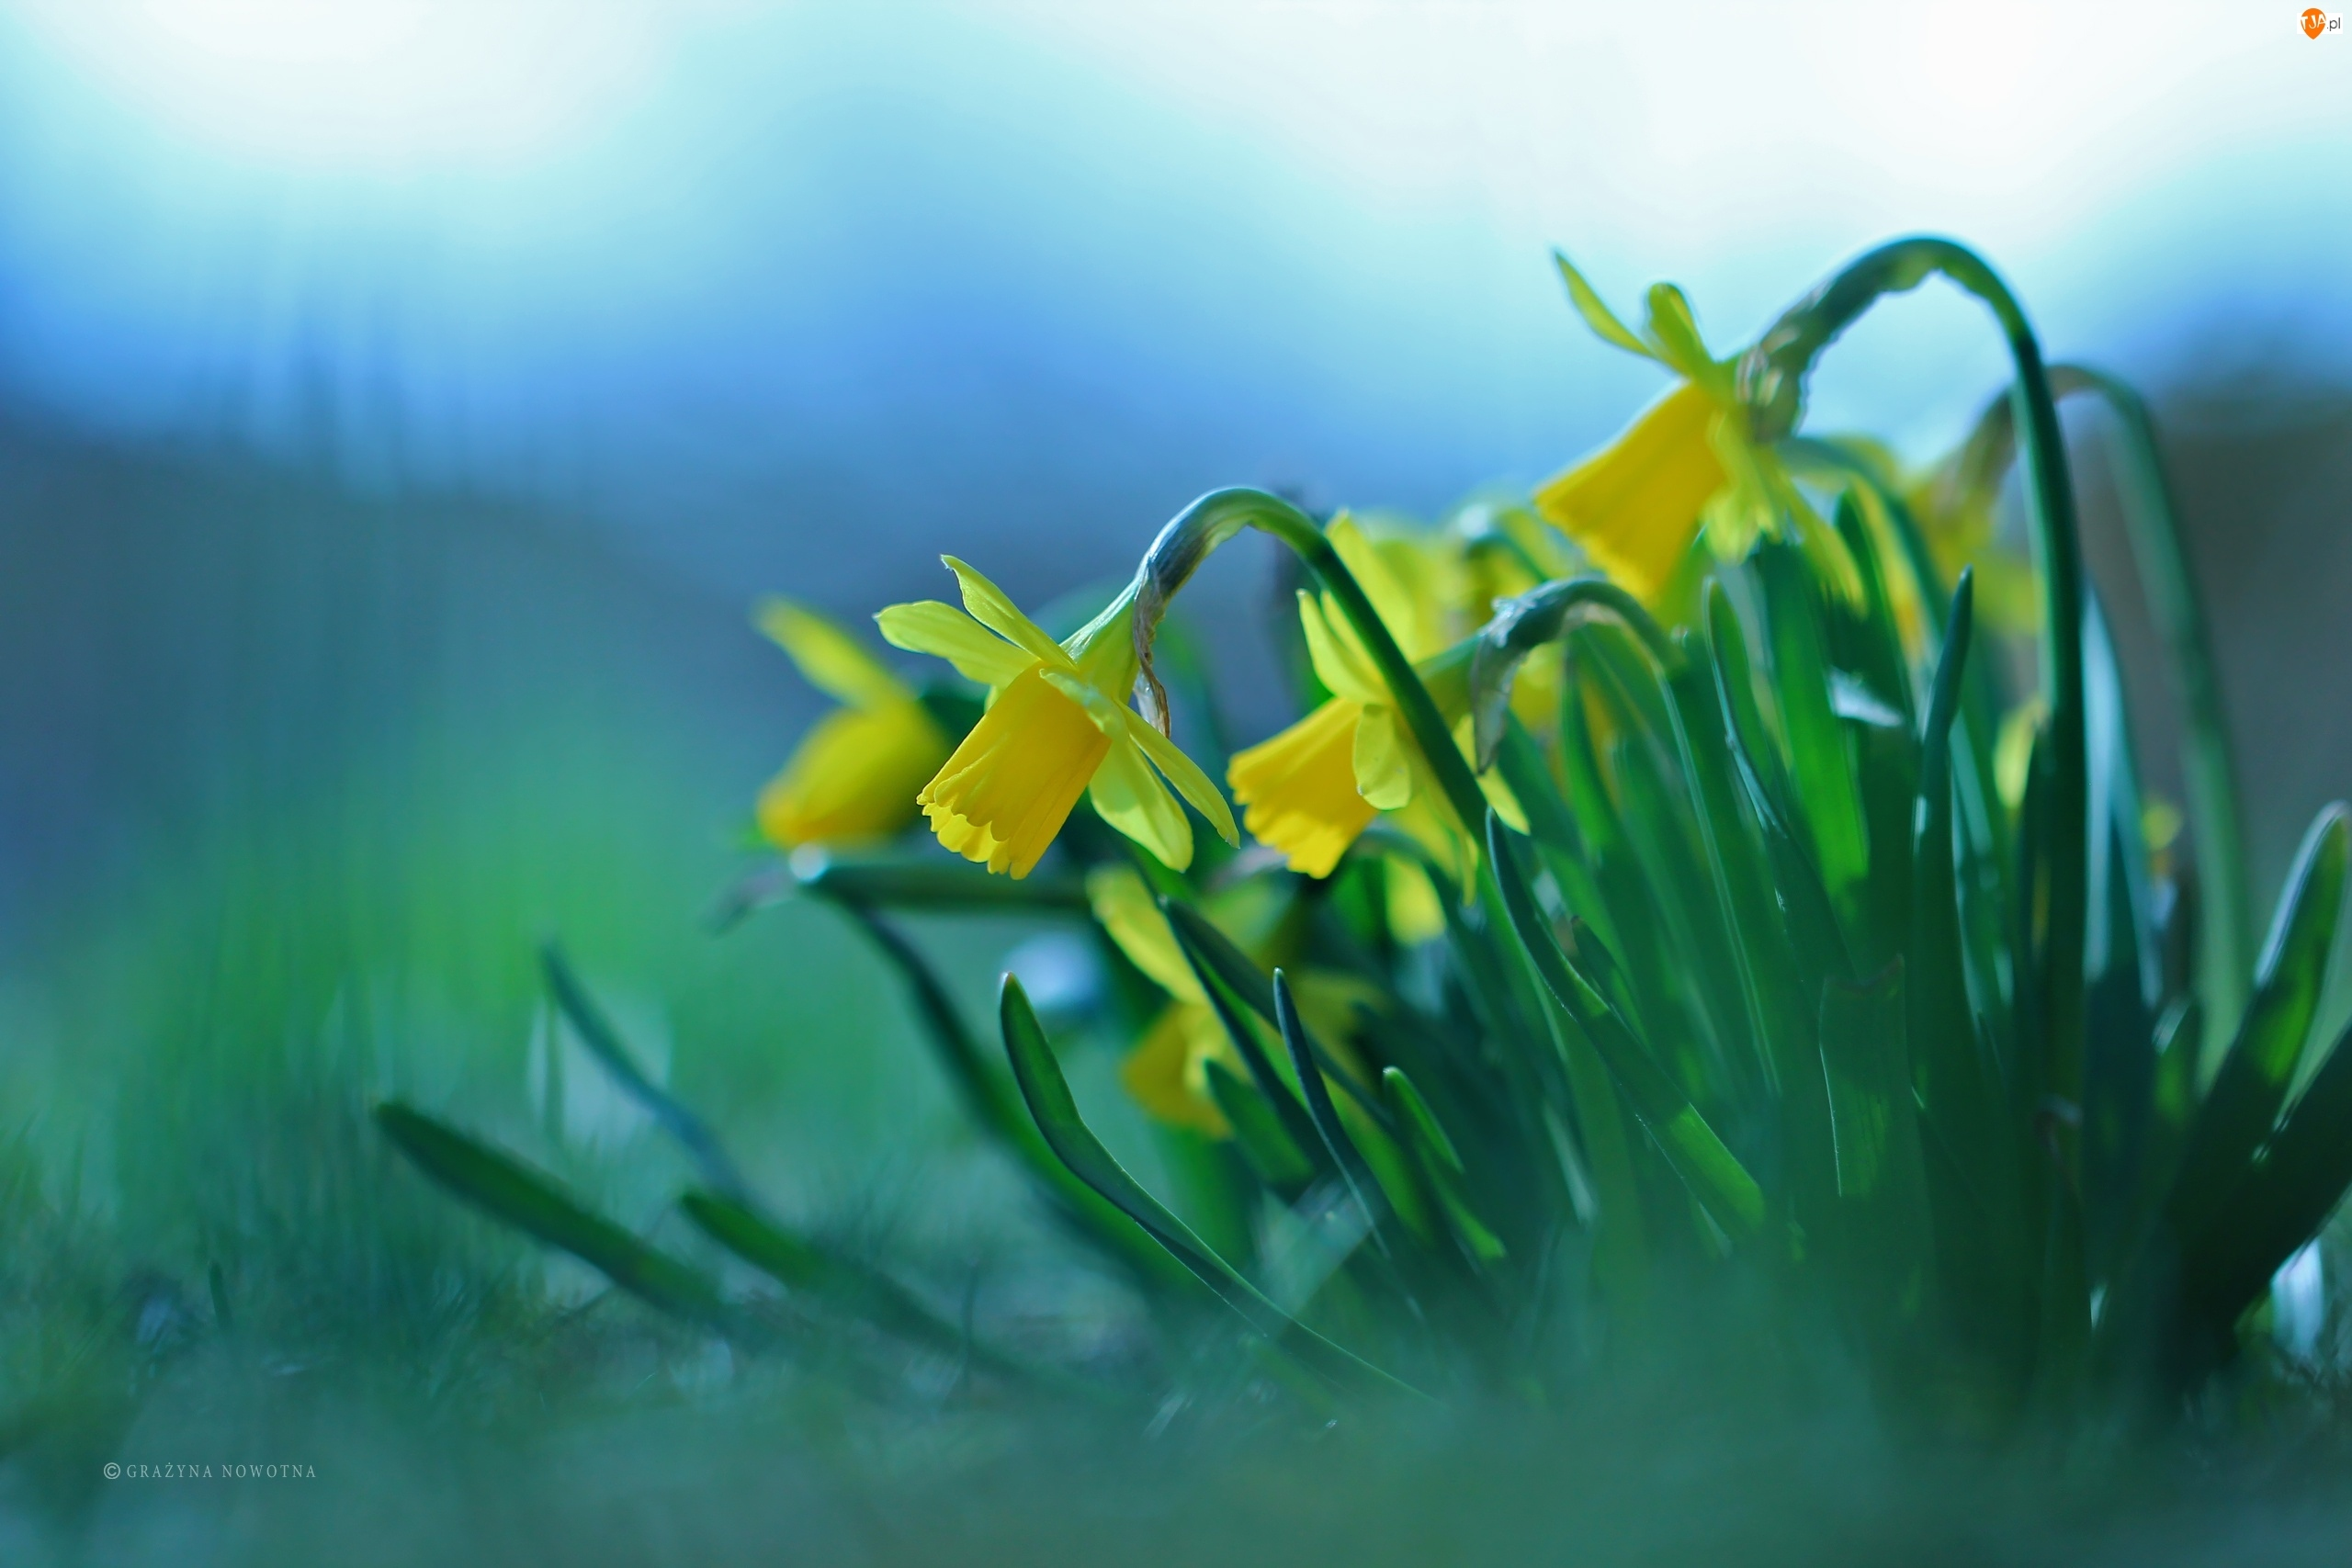 Kwiaty, Żonkile, Żółte